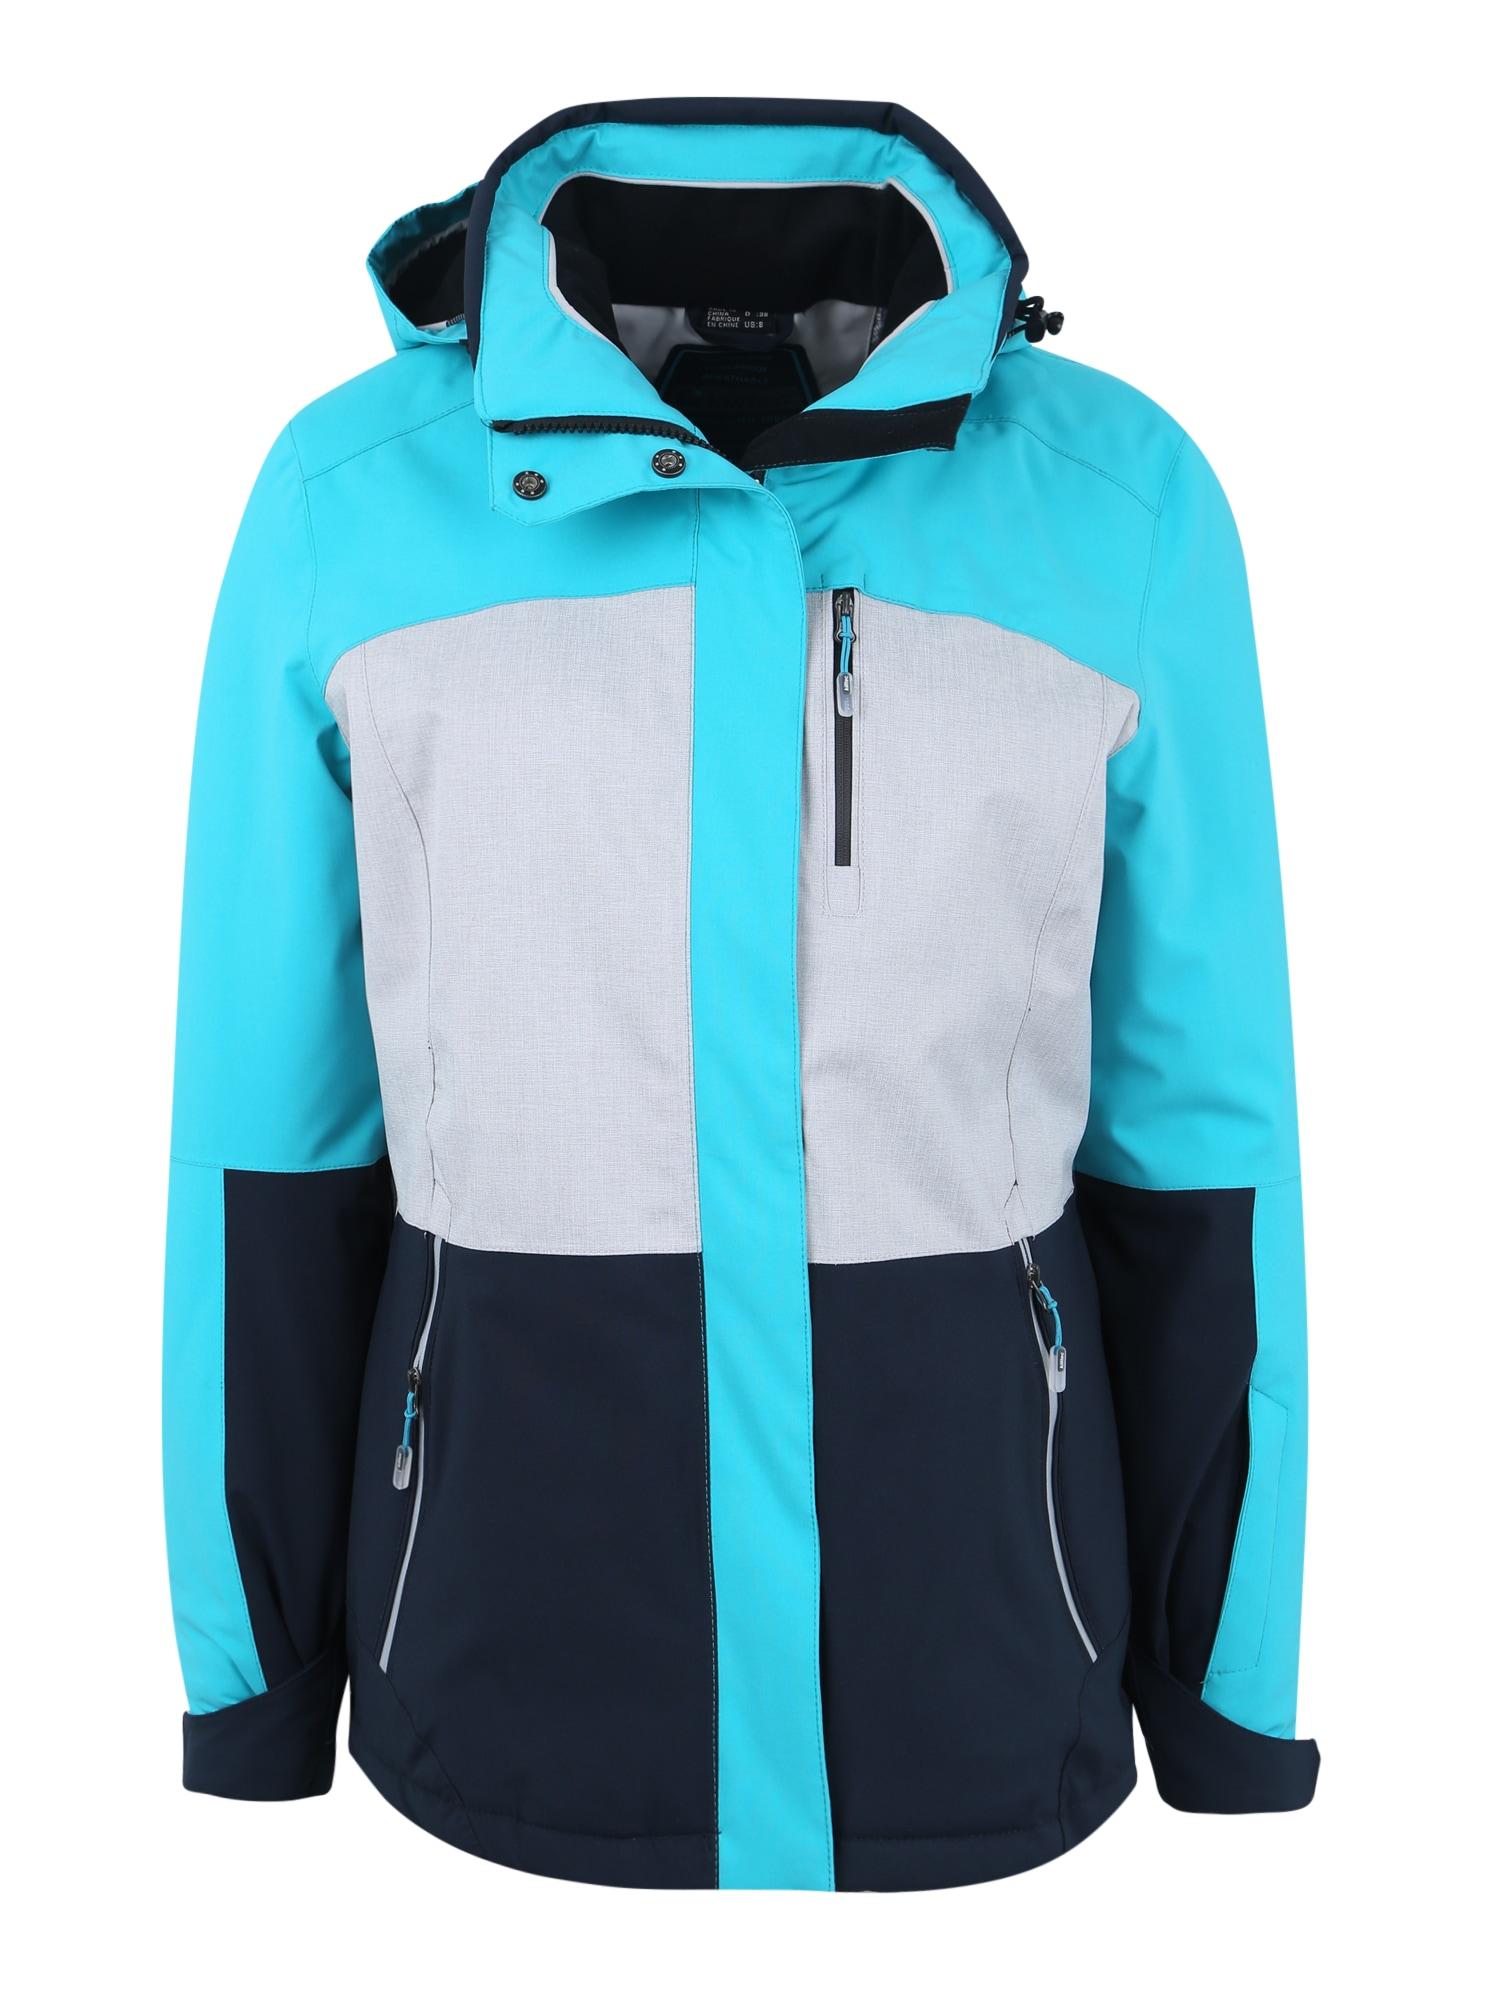 Outdoorová bunda Sewia aqua modrá mix barev KILLTEC